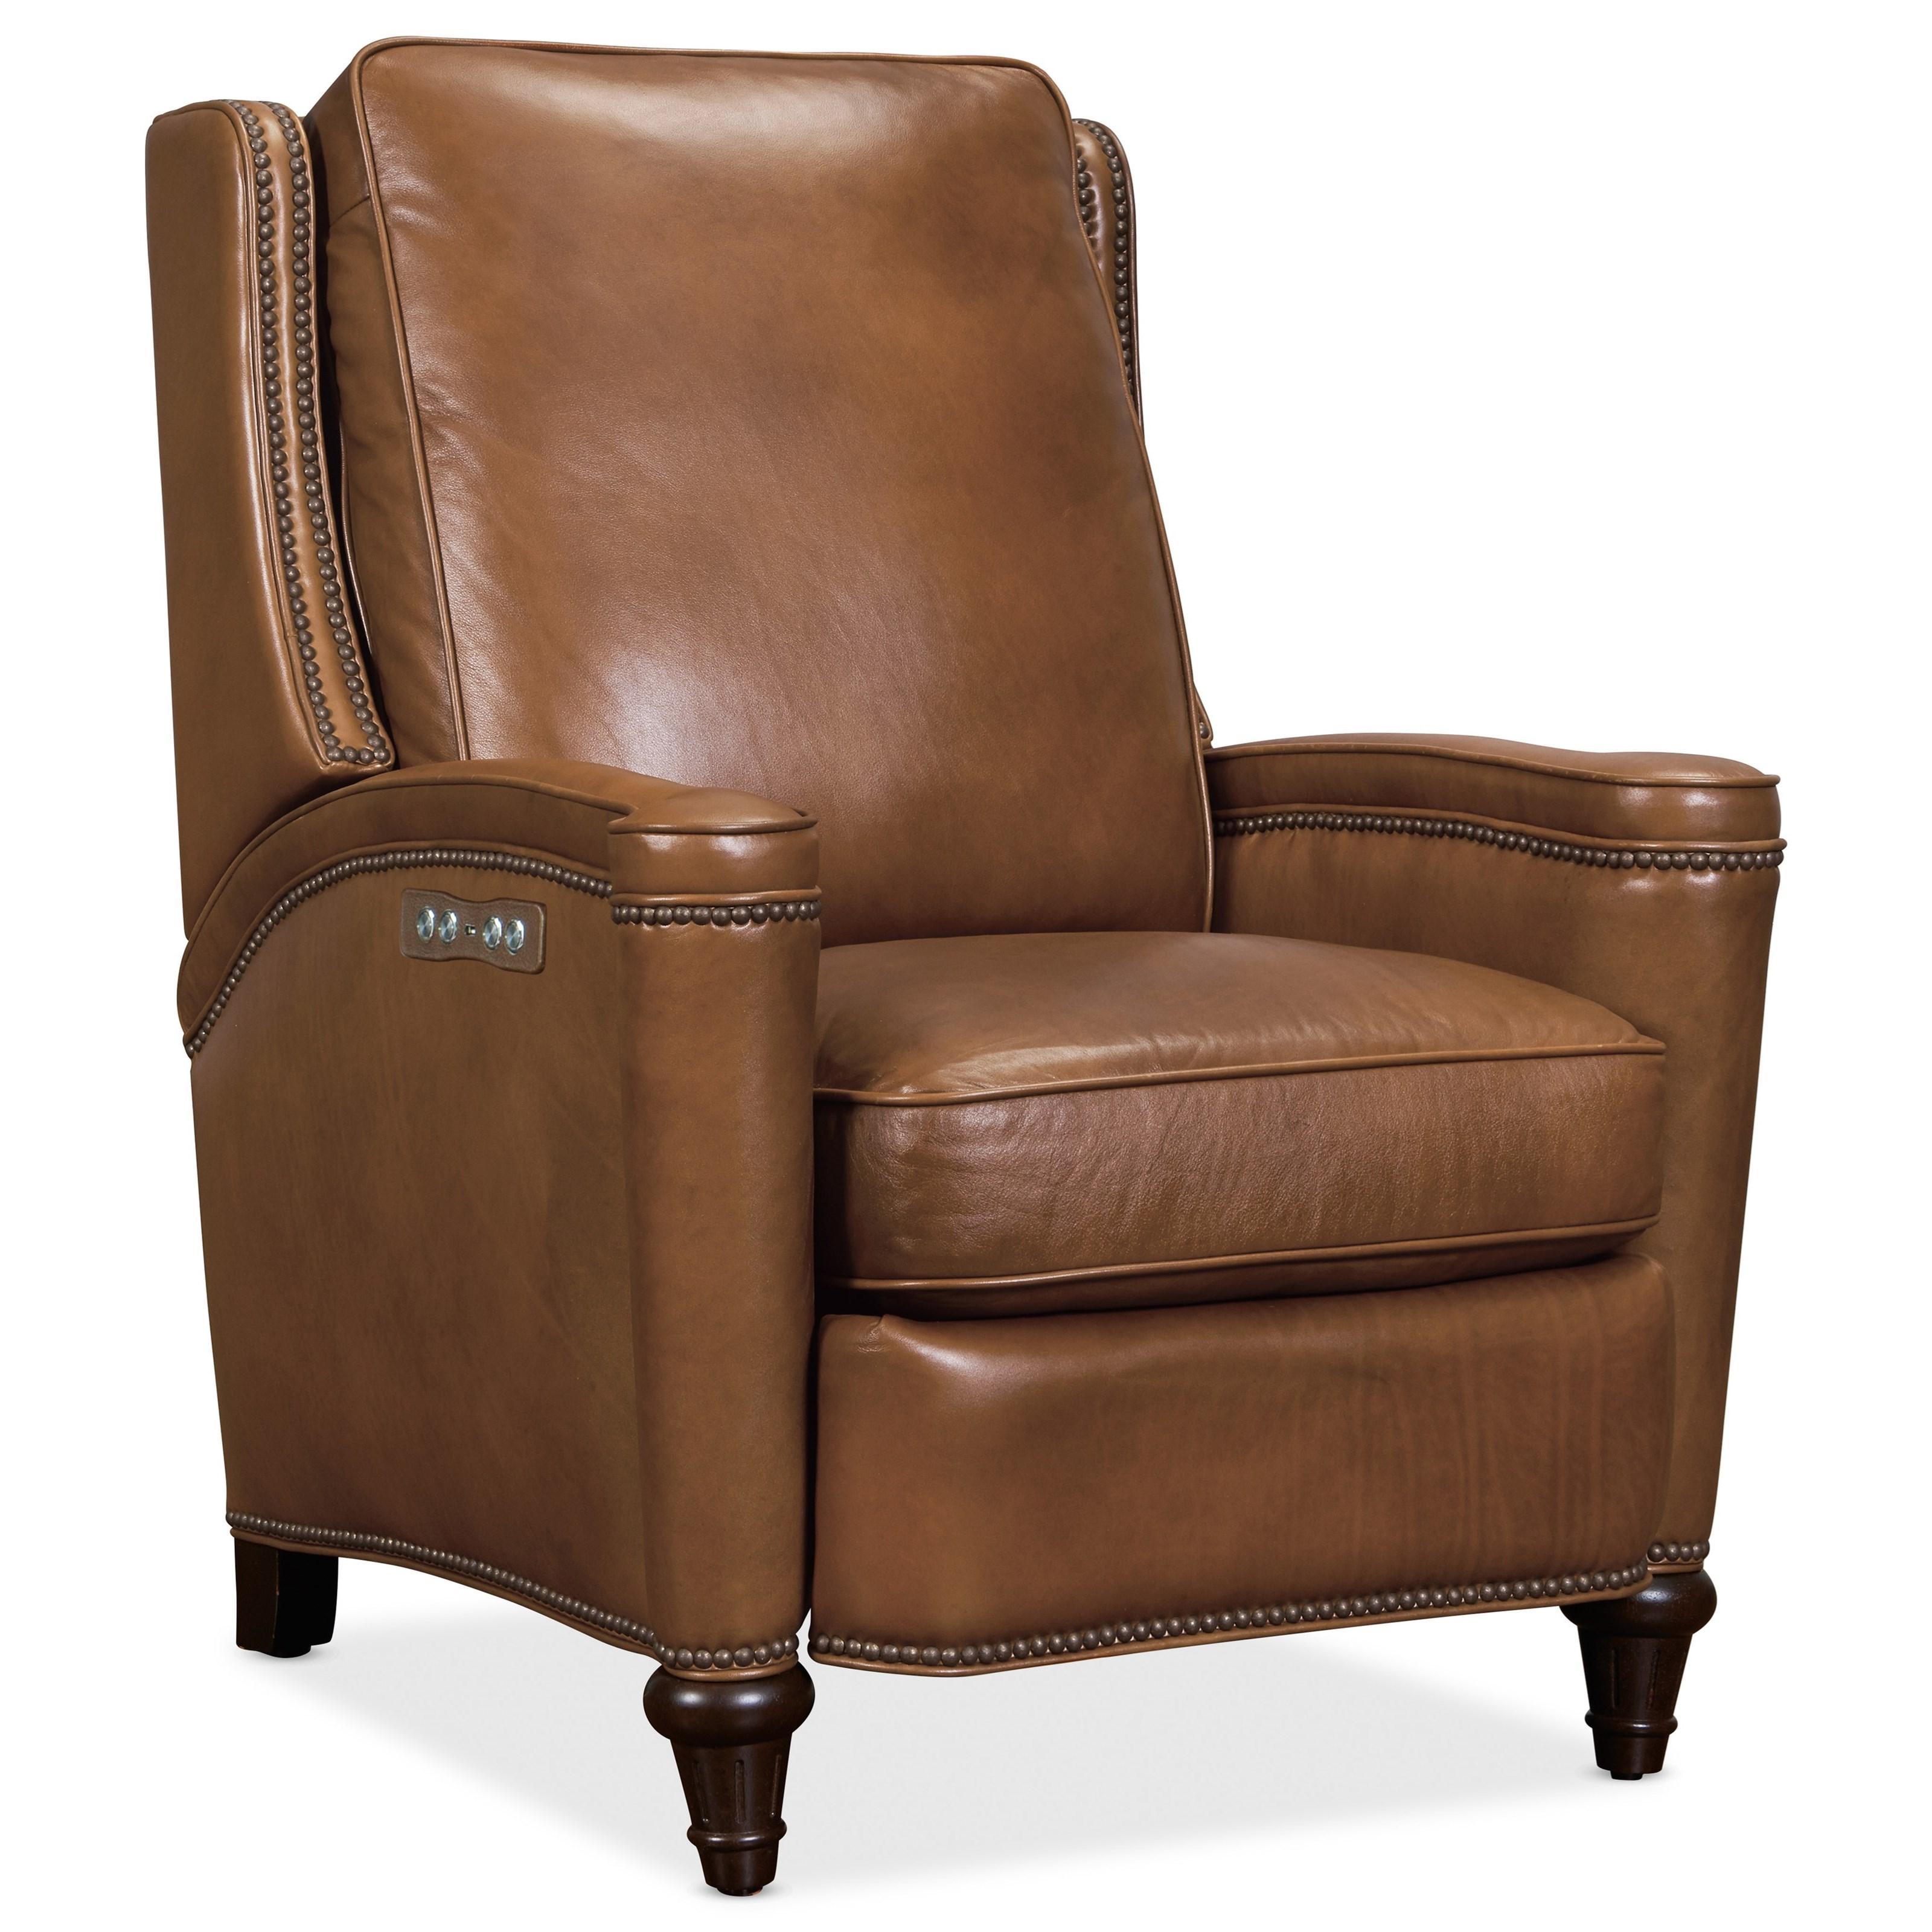 Rylea Power Recliner w/ Power Headrest by Hooker Furniture at Johnny Janosik